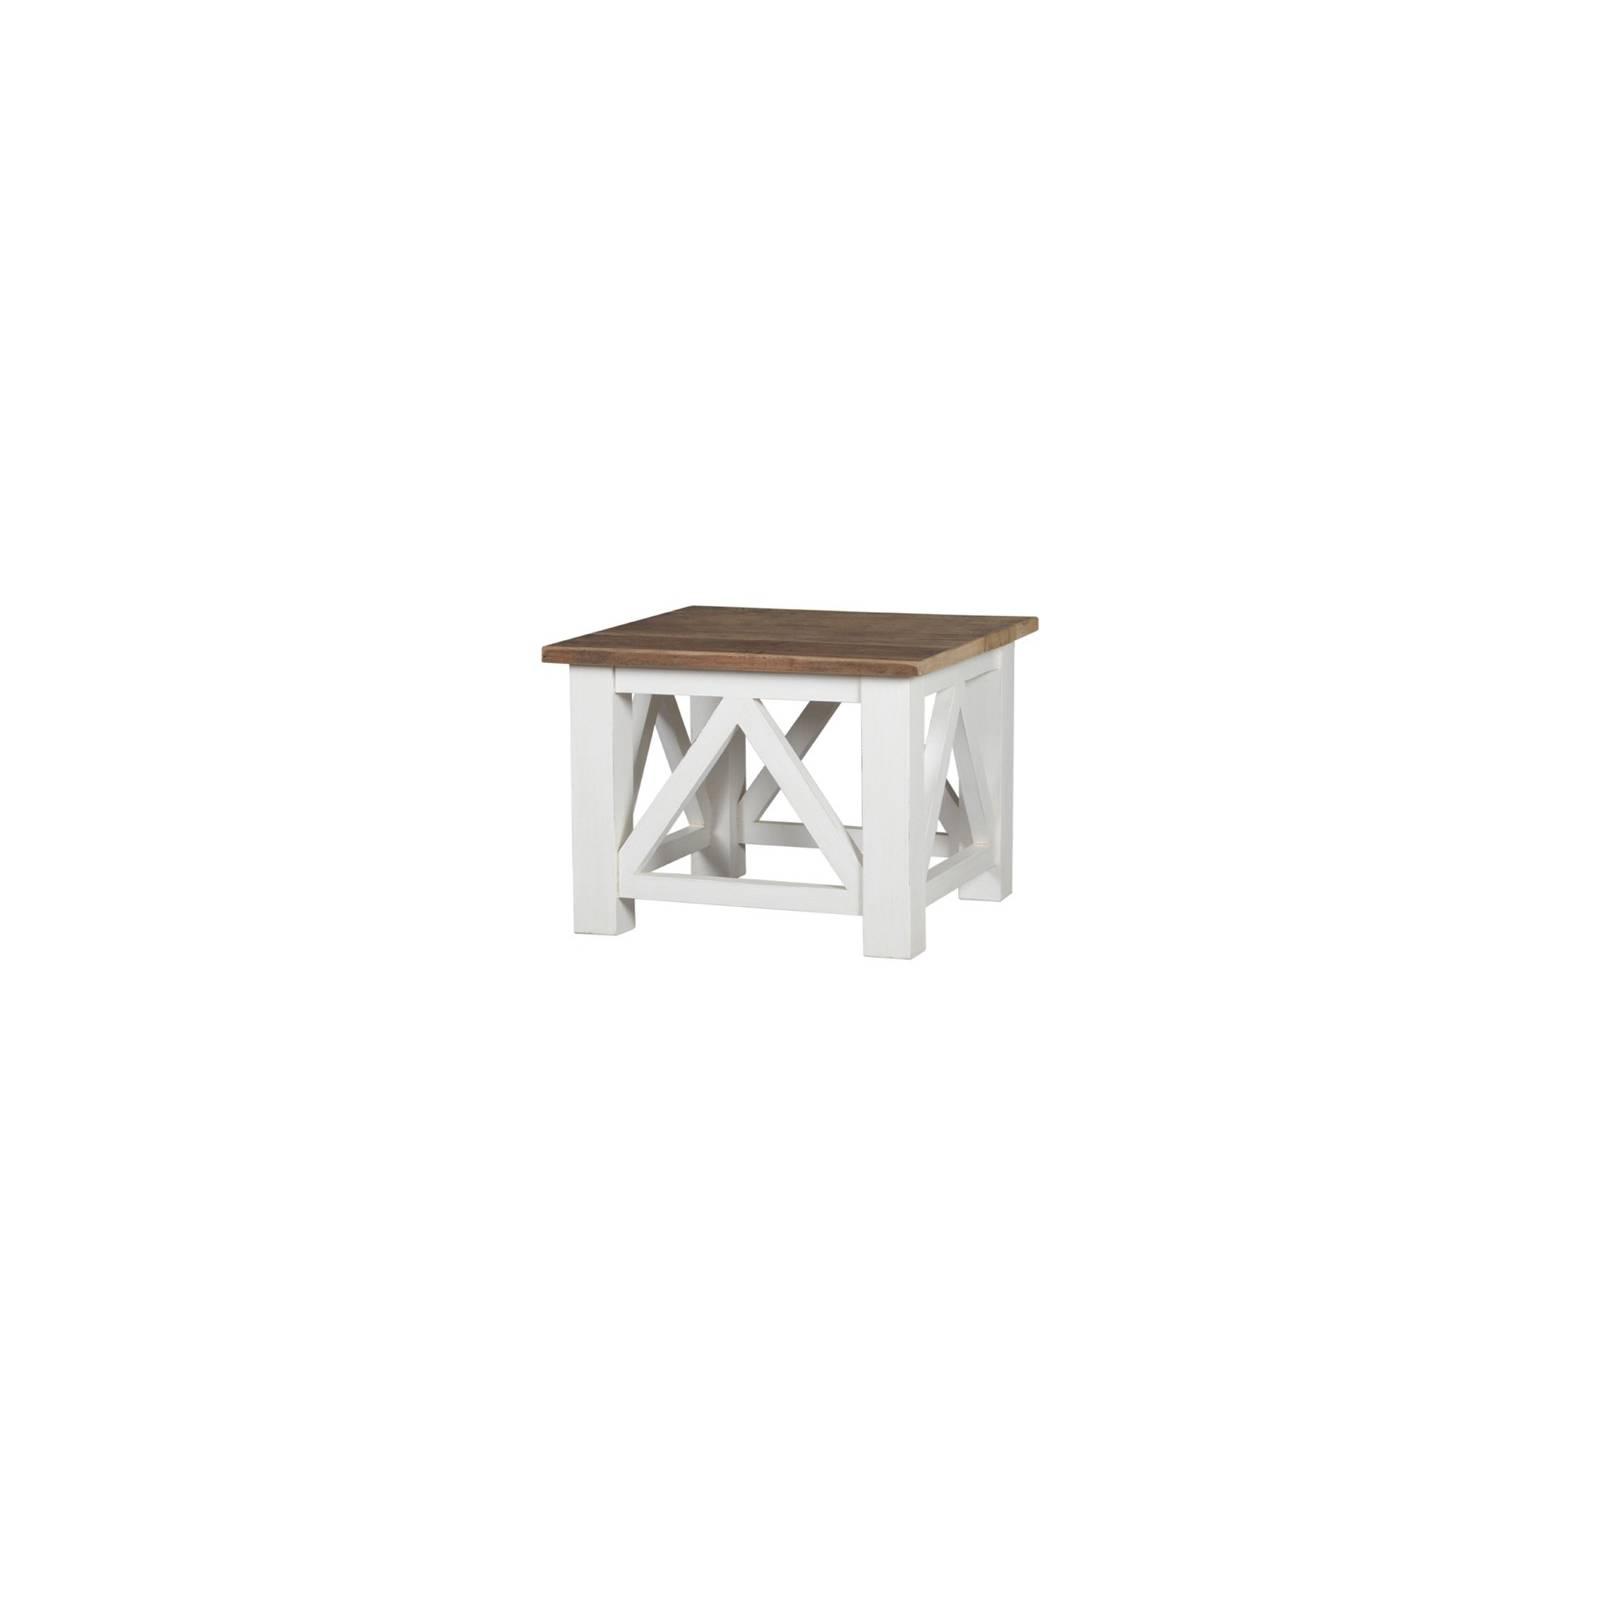 Table Basse Croisillons Olimpia Teck - meuble teck massif